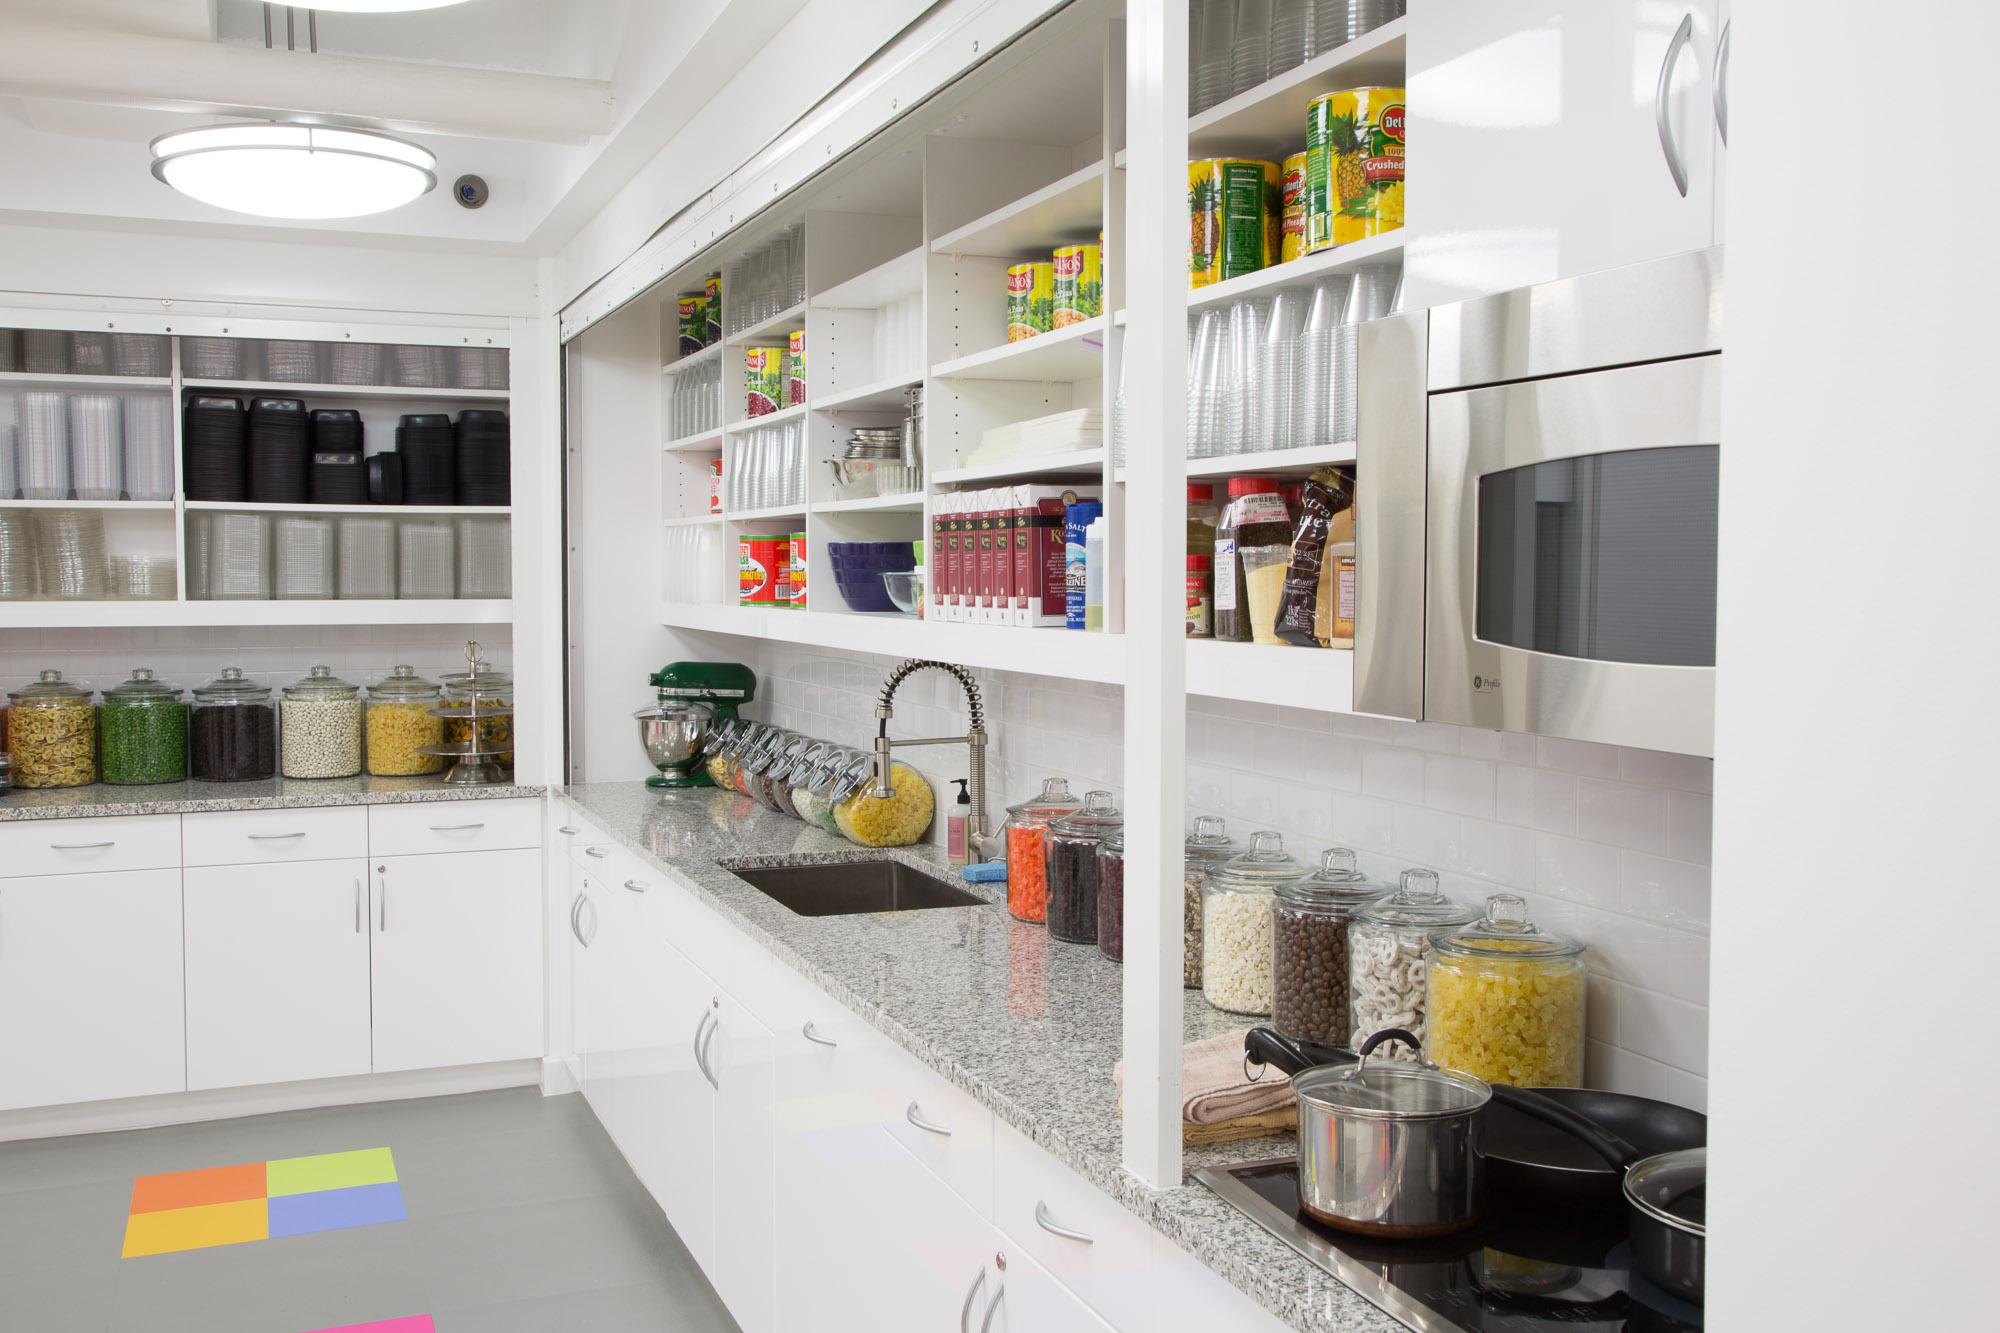 mackenzie kay - Kitchen2